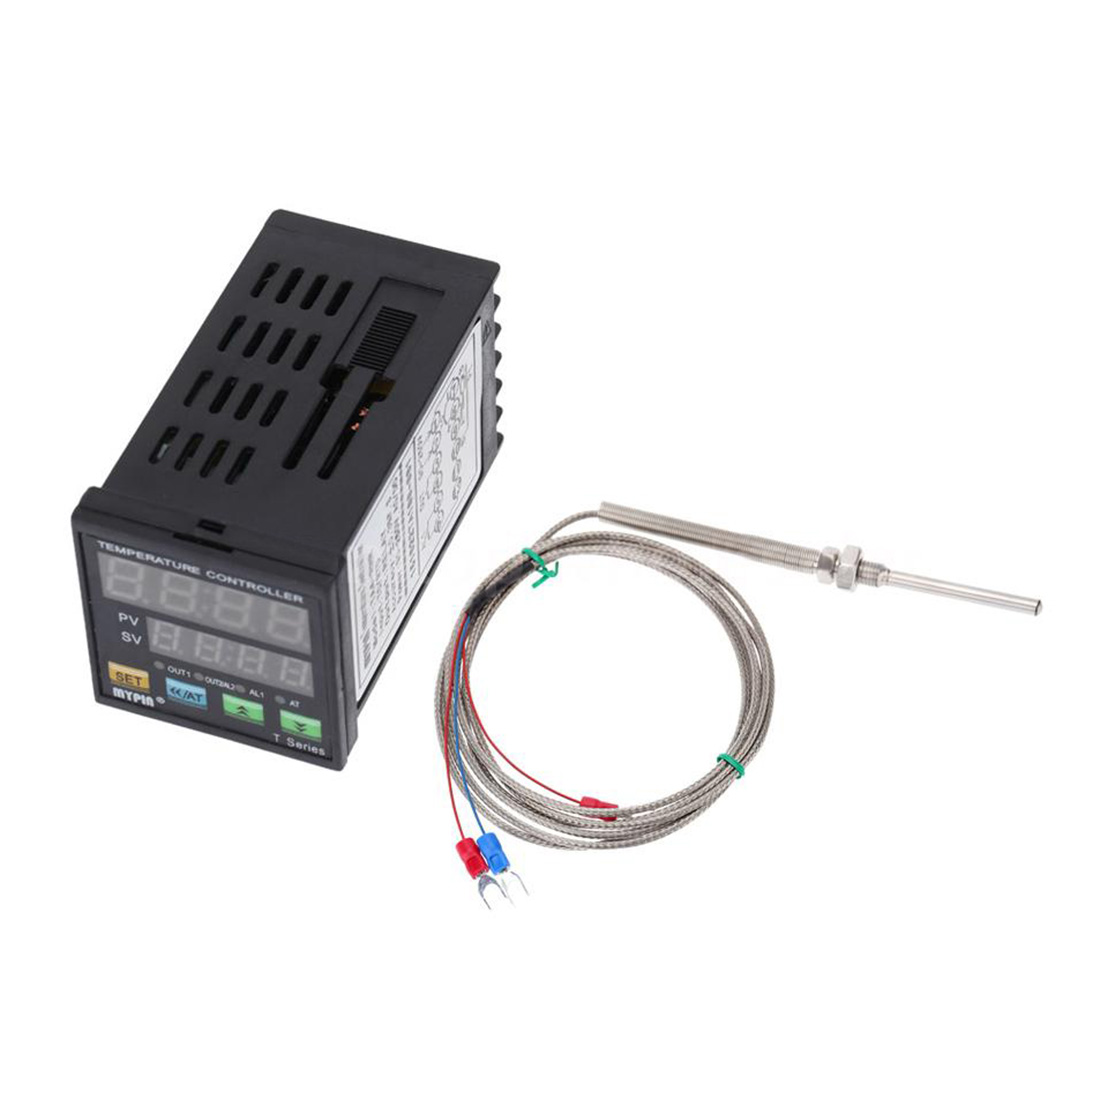 MYPIN Digital LED PID Temperature Controller + PT100 RTD Thermistor Sensor Probe 2pcs pt100 waterproof relay thermal probe temperature sensor temperature controller